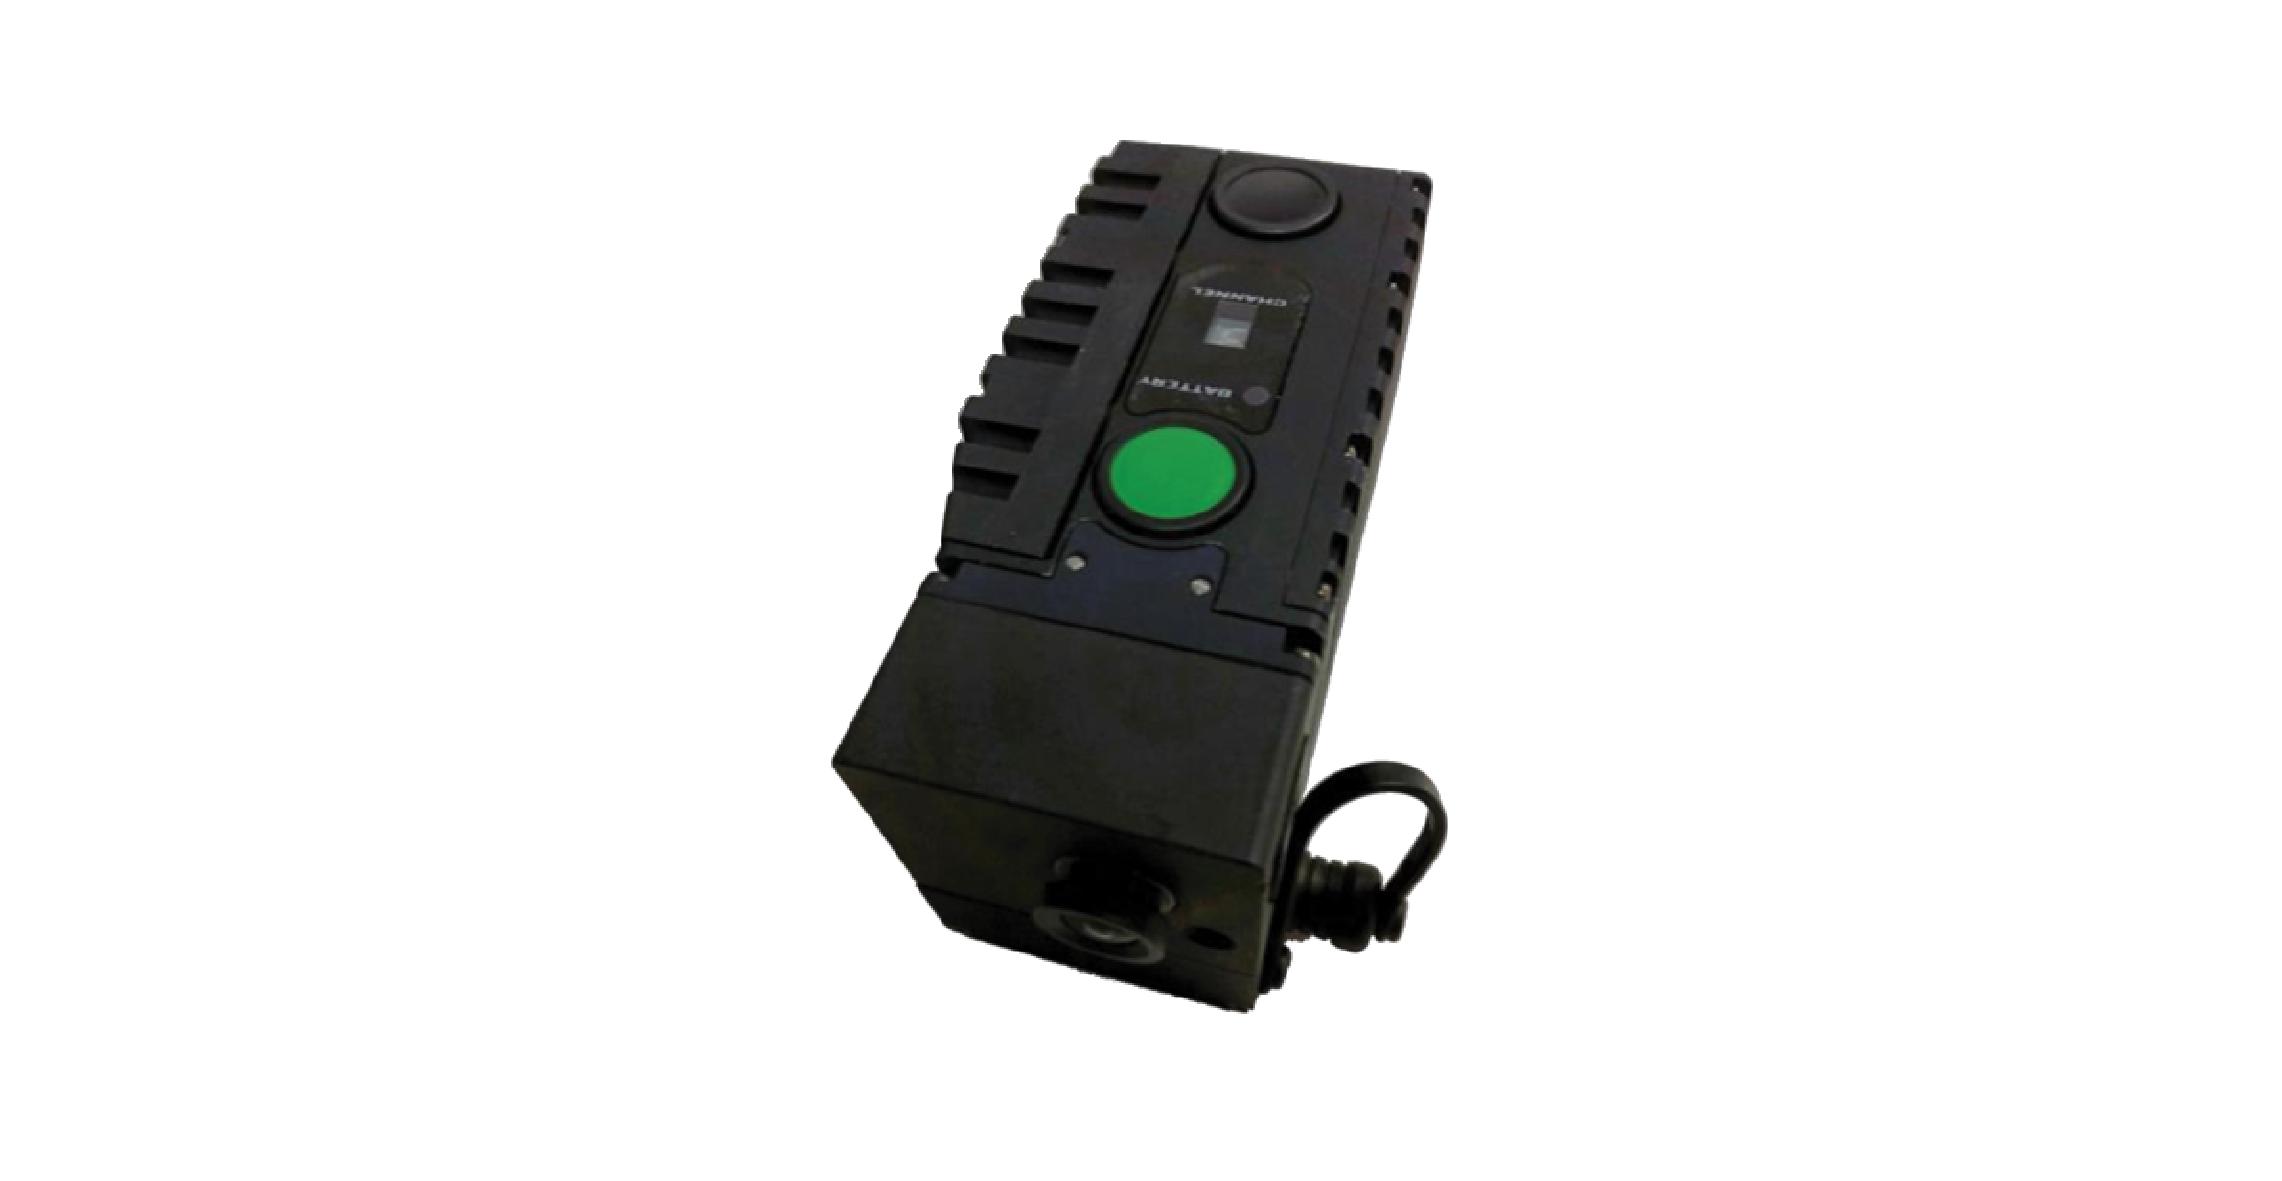 SOLO7 Drop Camera